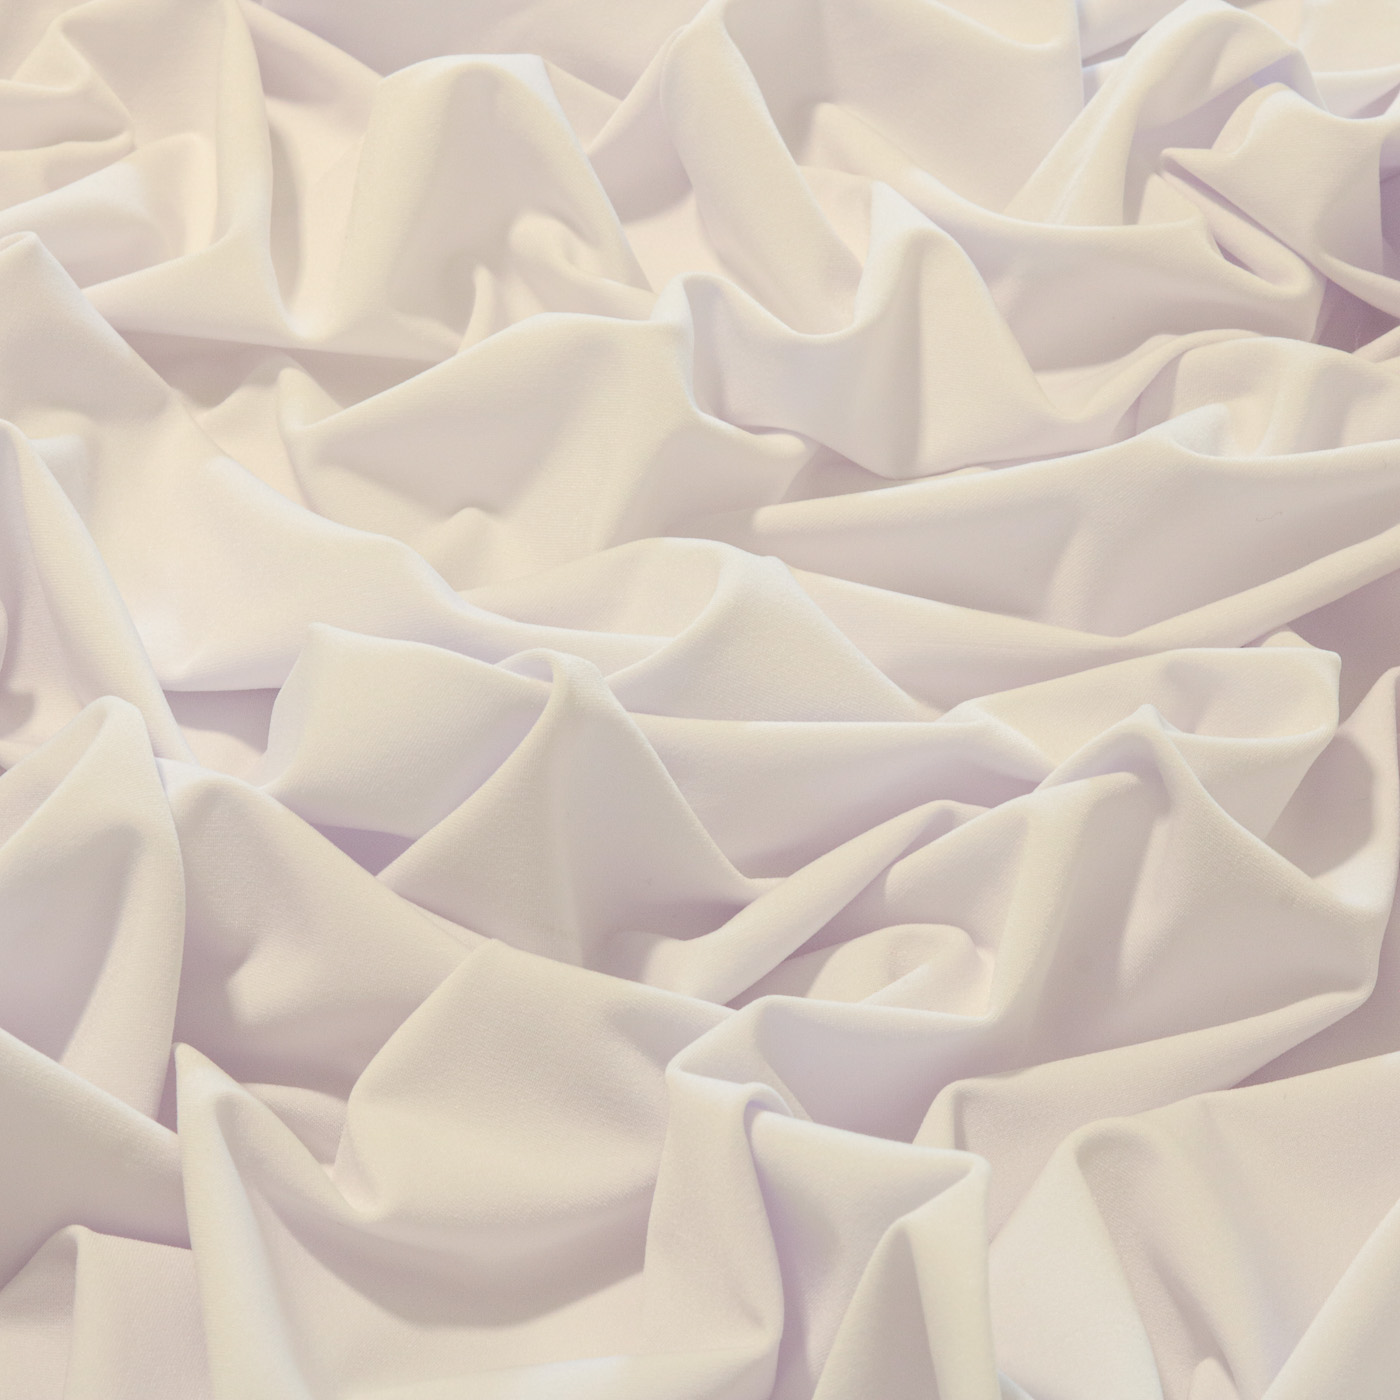 Tecido Malha Liganete Liso 96% Poliéster 4% Elastano  Branco